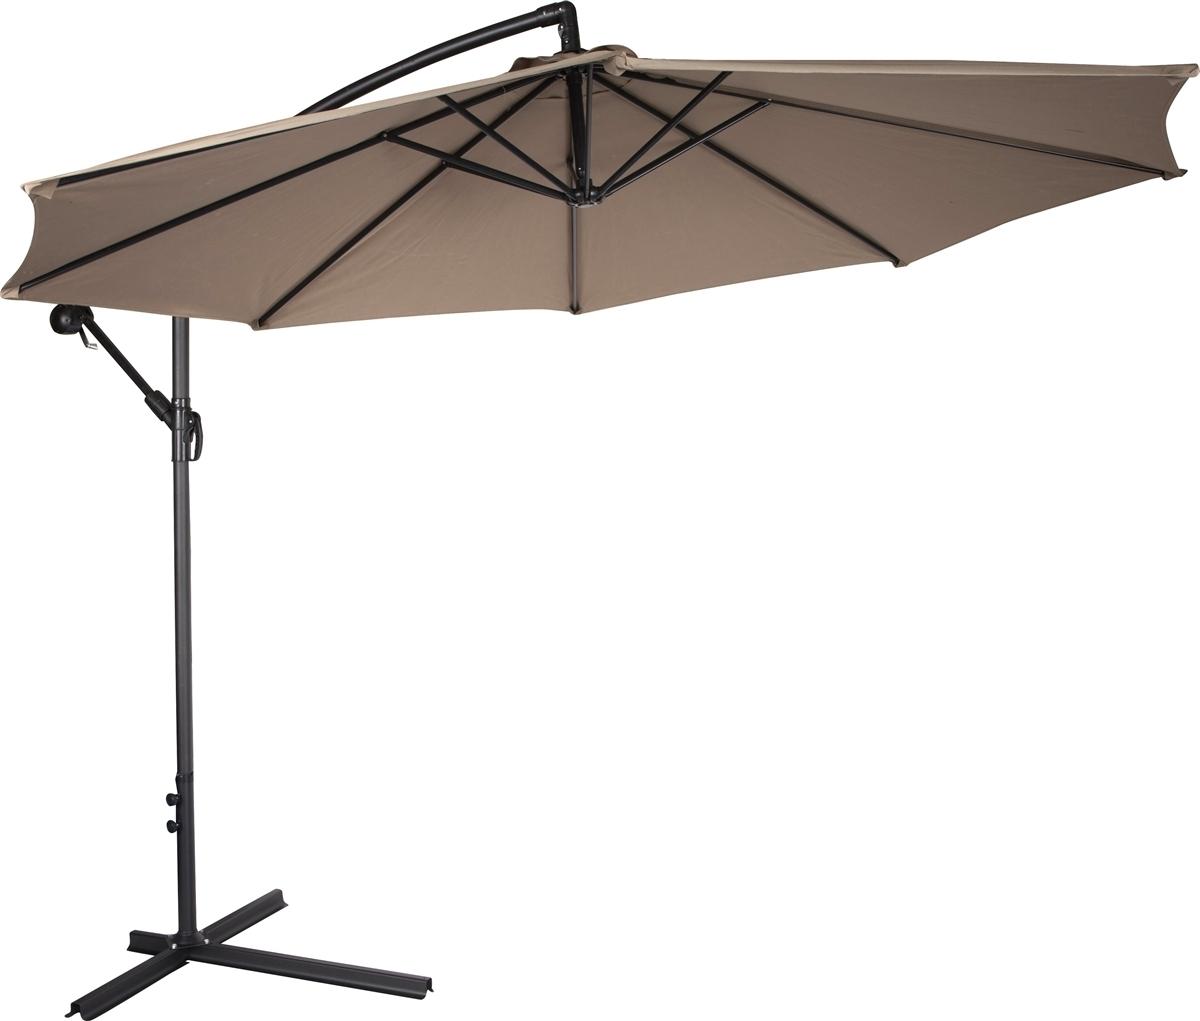 Custom Sunbrella Patio Umbrellas With Regard To Widely Used Buy Patio Umbrellas Custom Printed Square Canopy Market Umbrella (View 20 of 20)